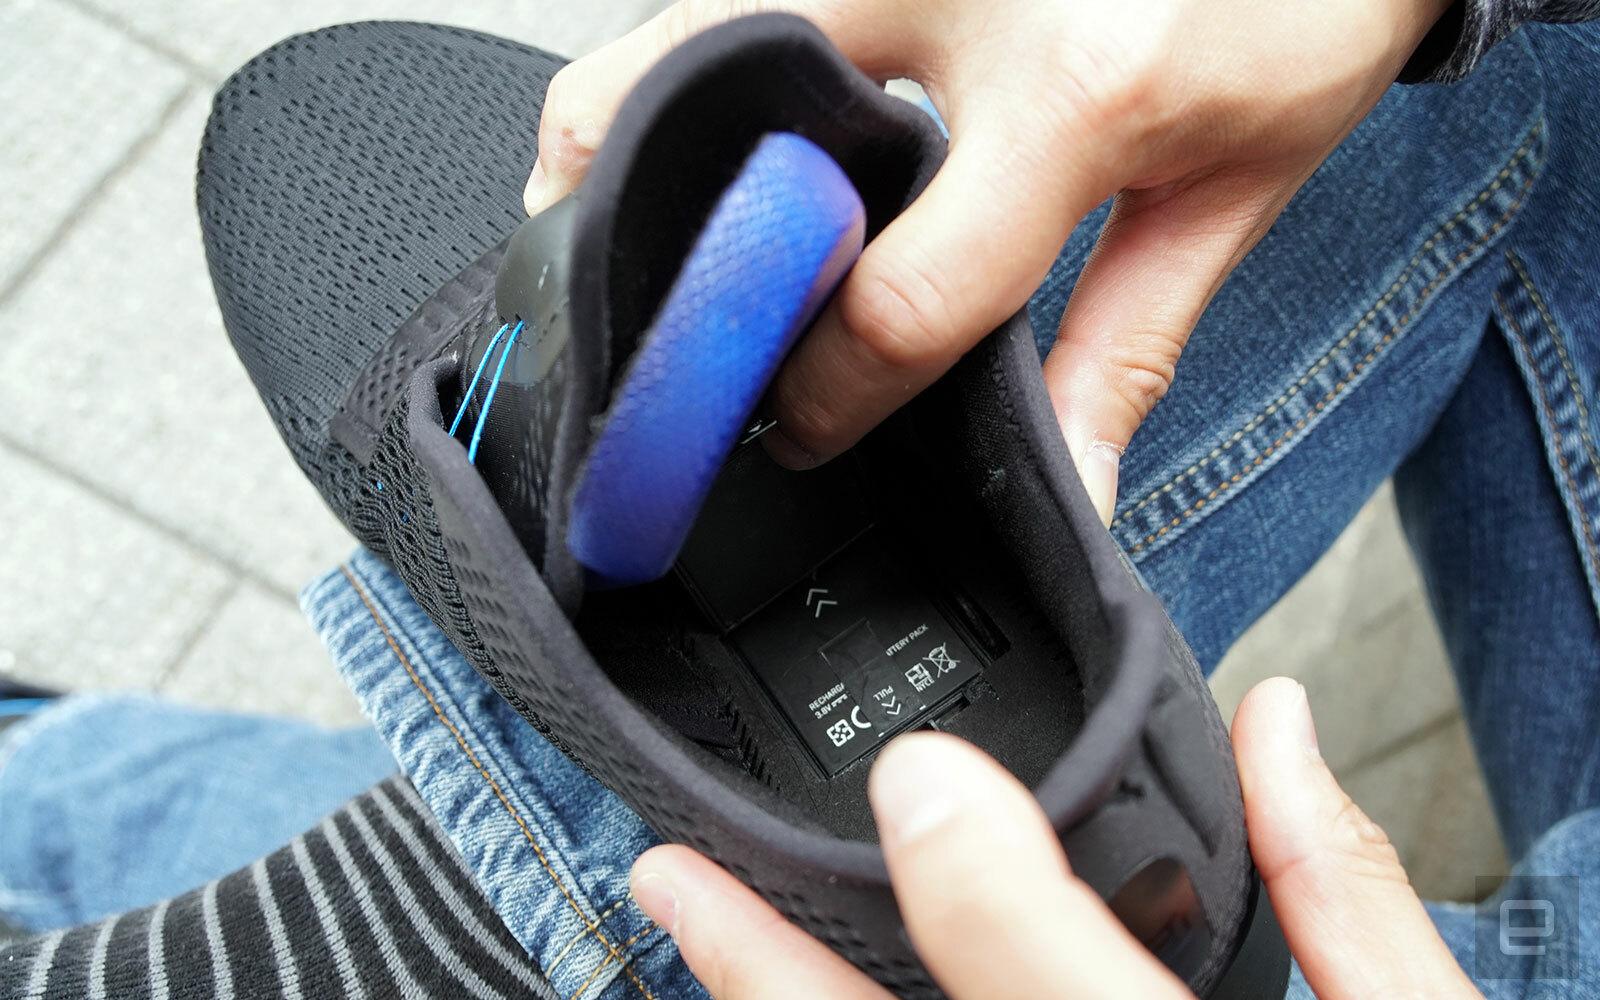 0660941d923e5f puma-fi-self-lacing-shoes-6 - FunkyKit